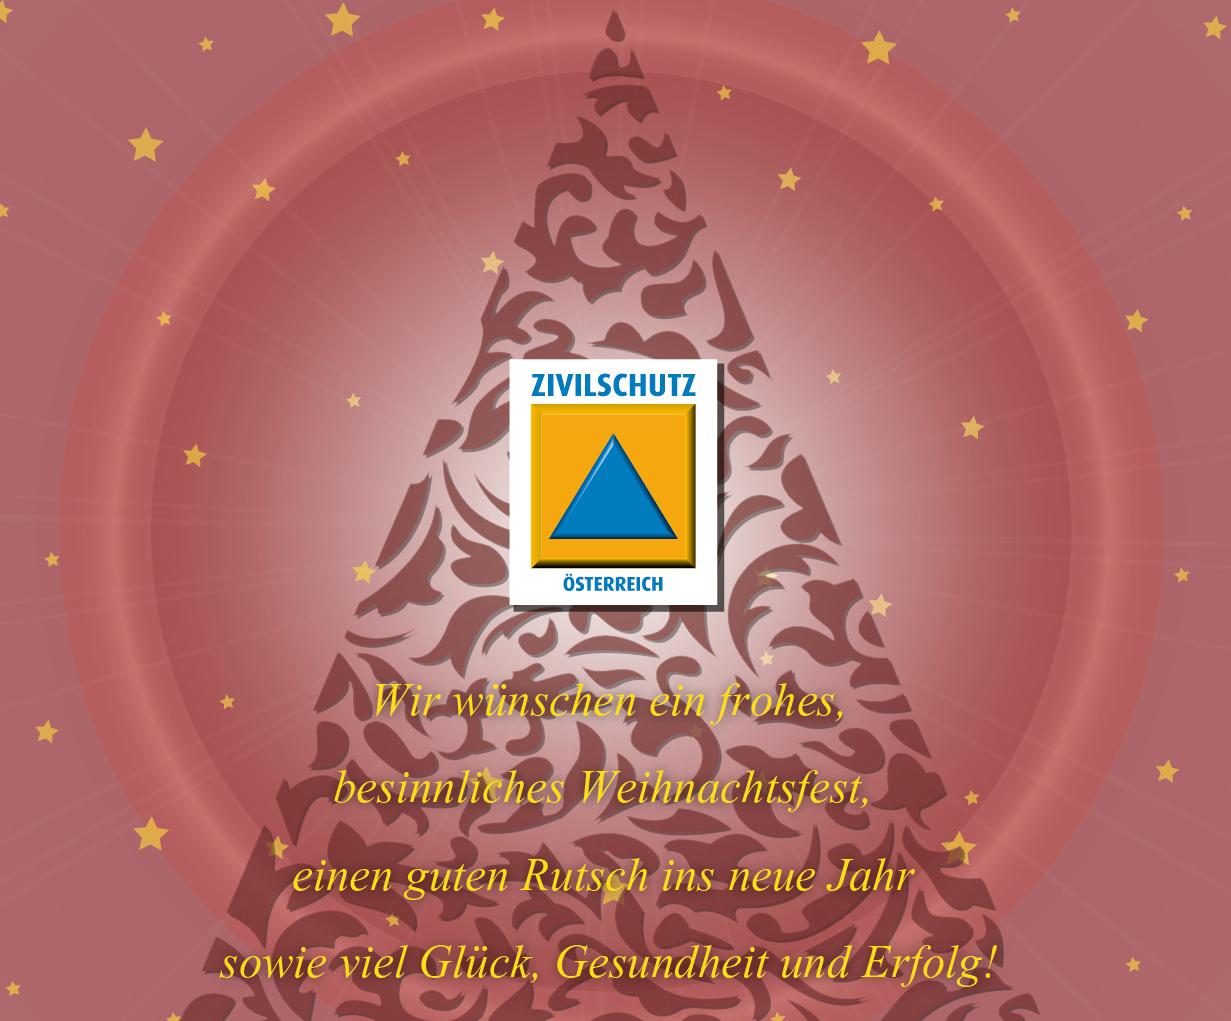 http://www.siz.cc/tools/image.php?image=Weihnachten.jpg&width=&height=